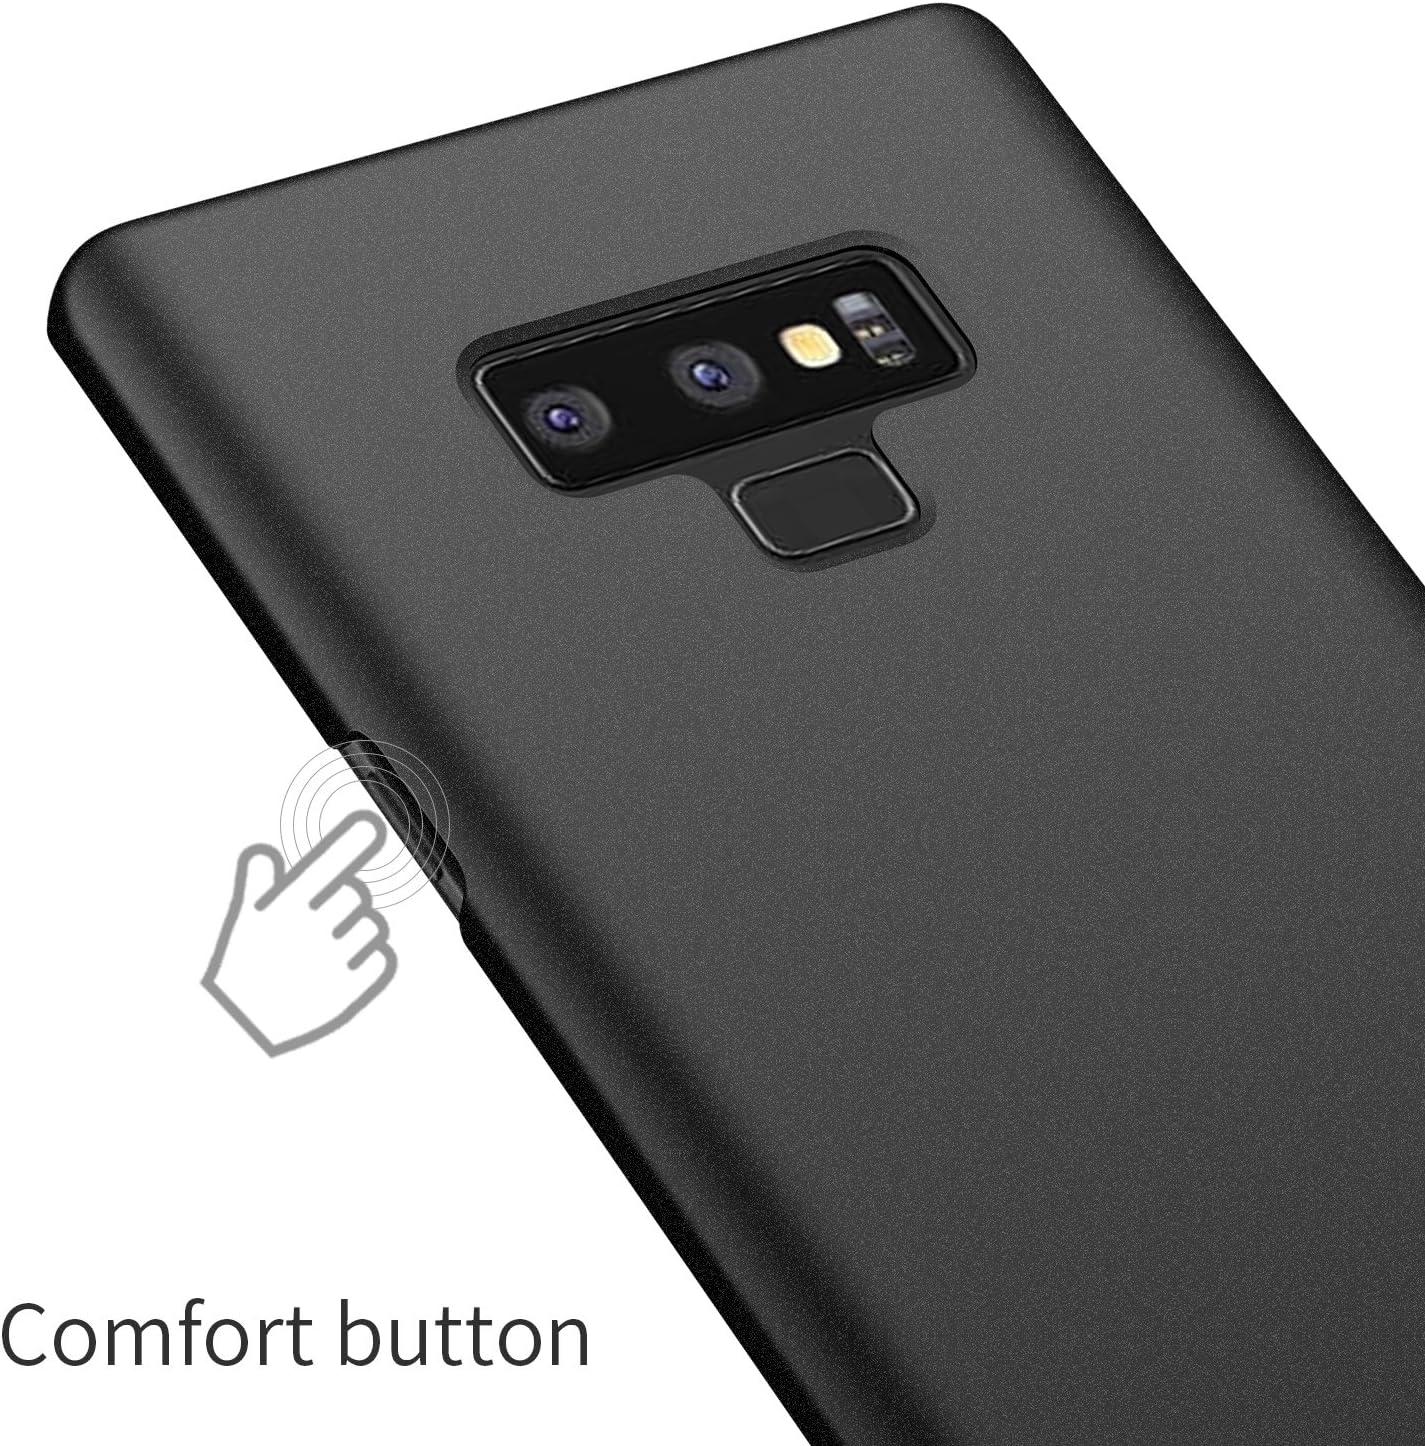 Arkour Galaxy Note 9 Case, Minimalist Excellent Grip Non-Slip Matte Surface Hard PC Slim Cover for Samsung Galaxy Note 9 (Gravel Black)